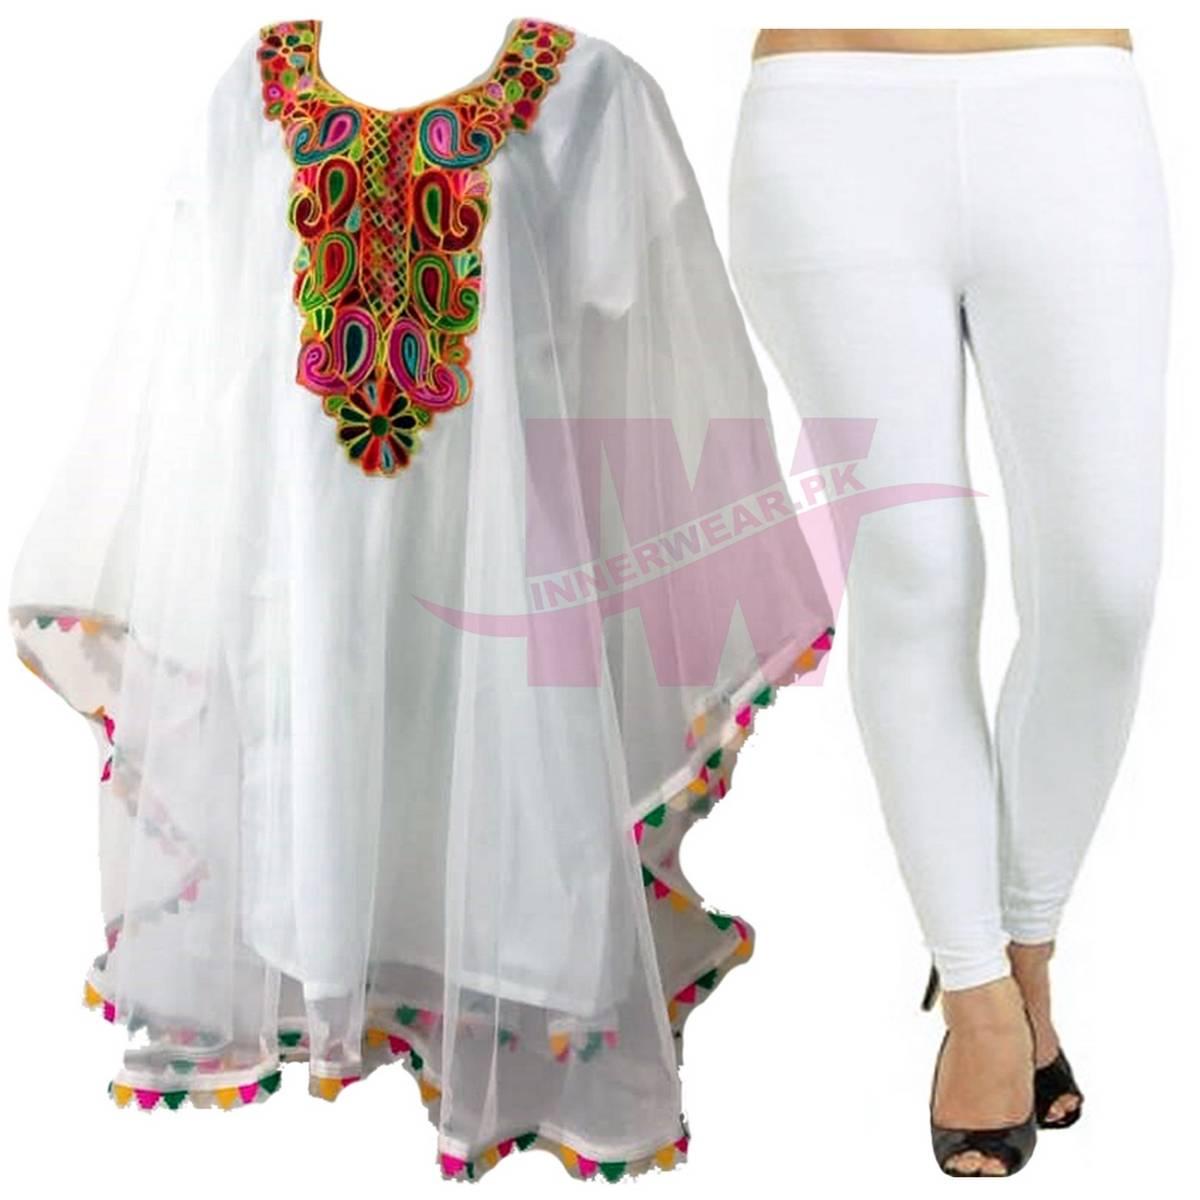 Women Ladies Girls Pure Net Kurti Kaftan Shirt Frock Top Kameez Poncho With Matching Cotton Tights Legging Special Event Eid Dress Party Wear Wedding Wear Free Size